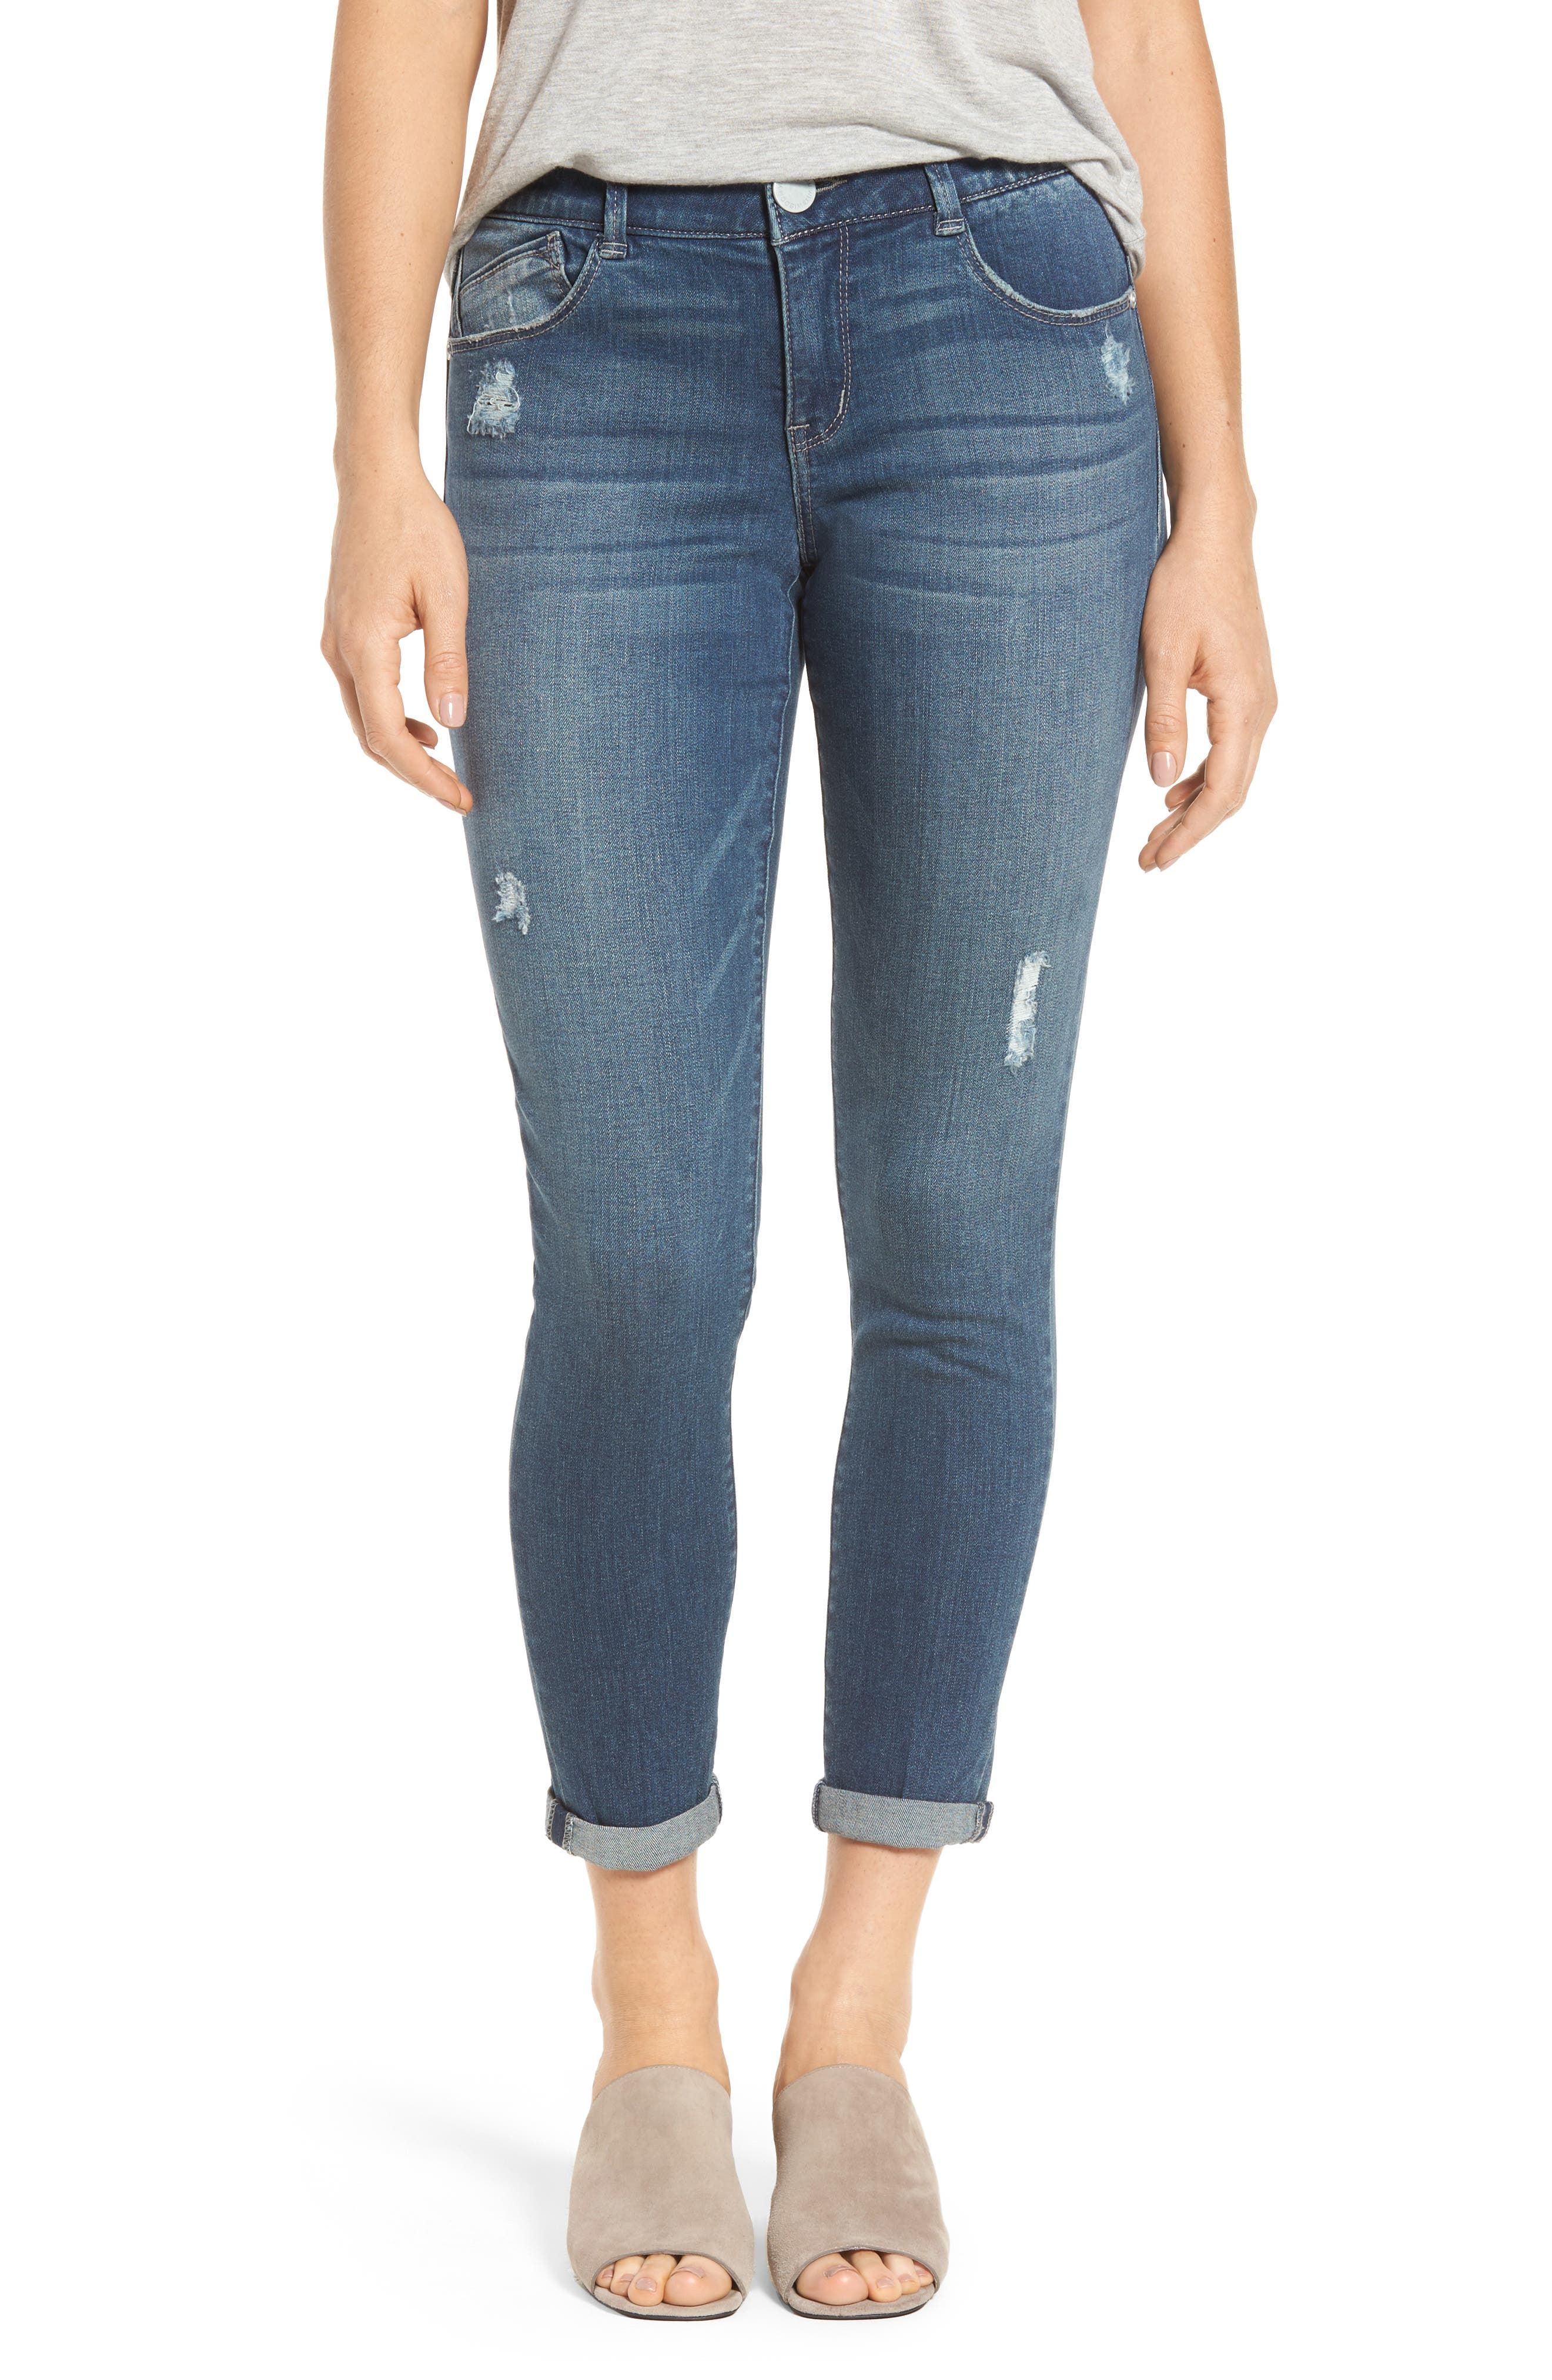 Main Image - Wit & Wisdom Ab-solution Boyfriend Ankle Jeans (Nordstrom Exclusive) (Regular & Petite)